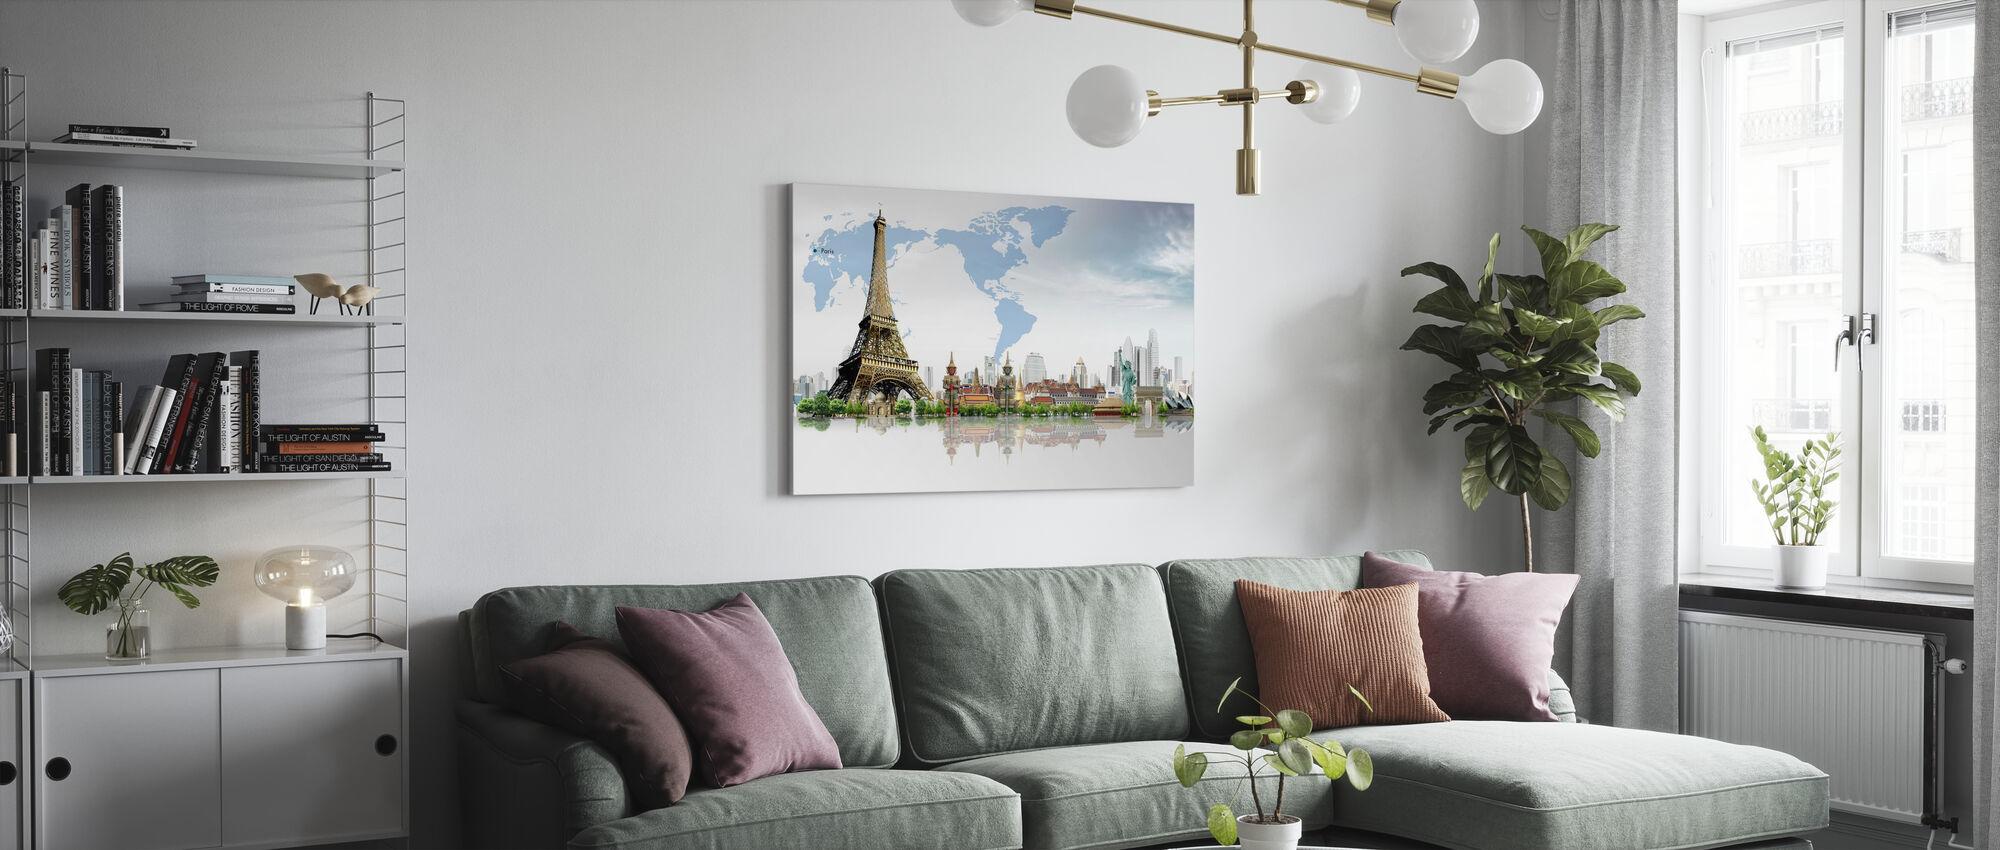 Travel Concept - Canvas print - Living Room